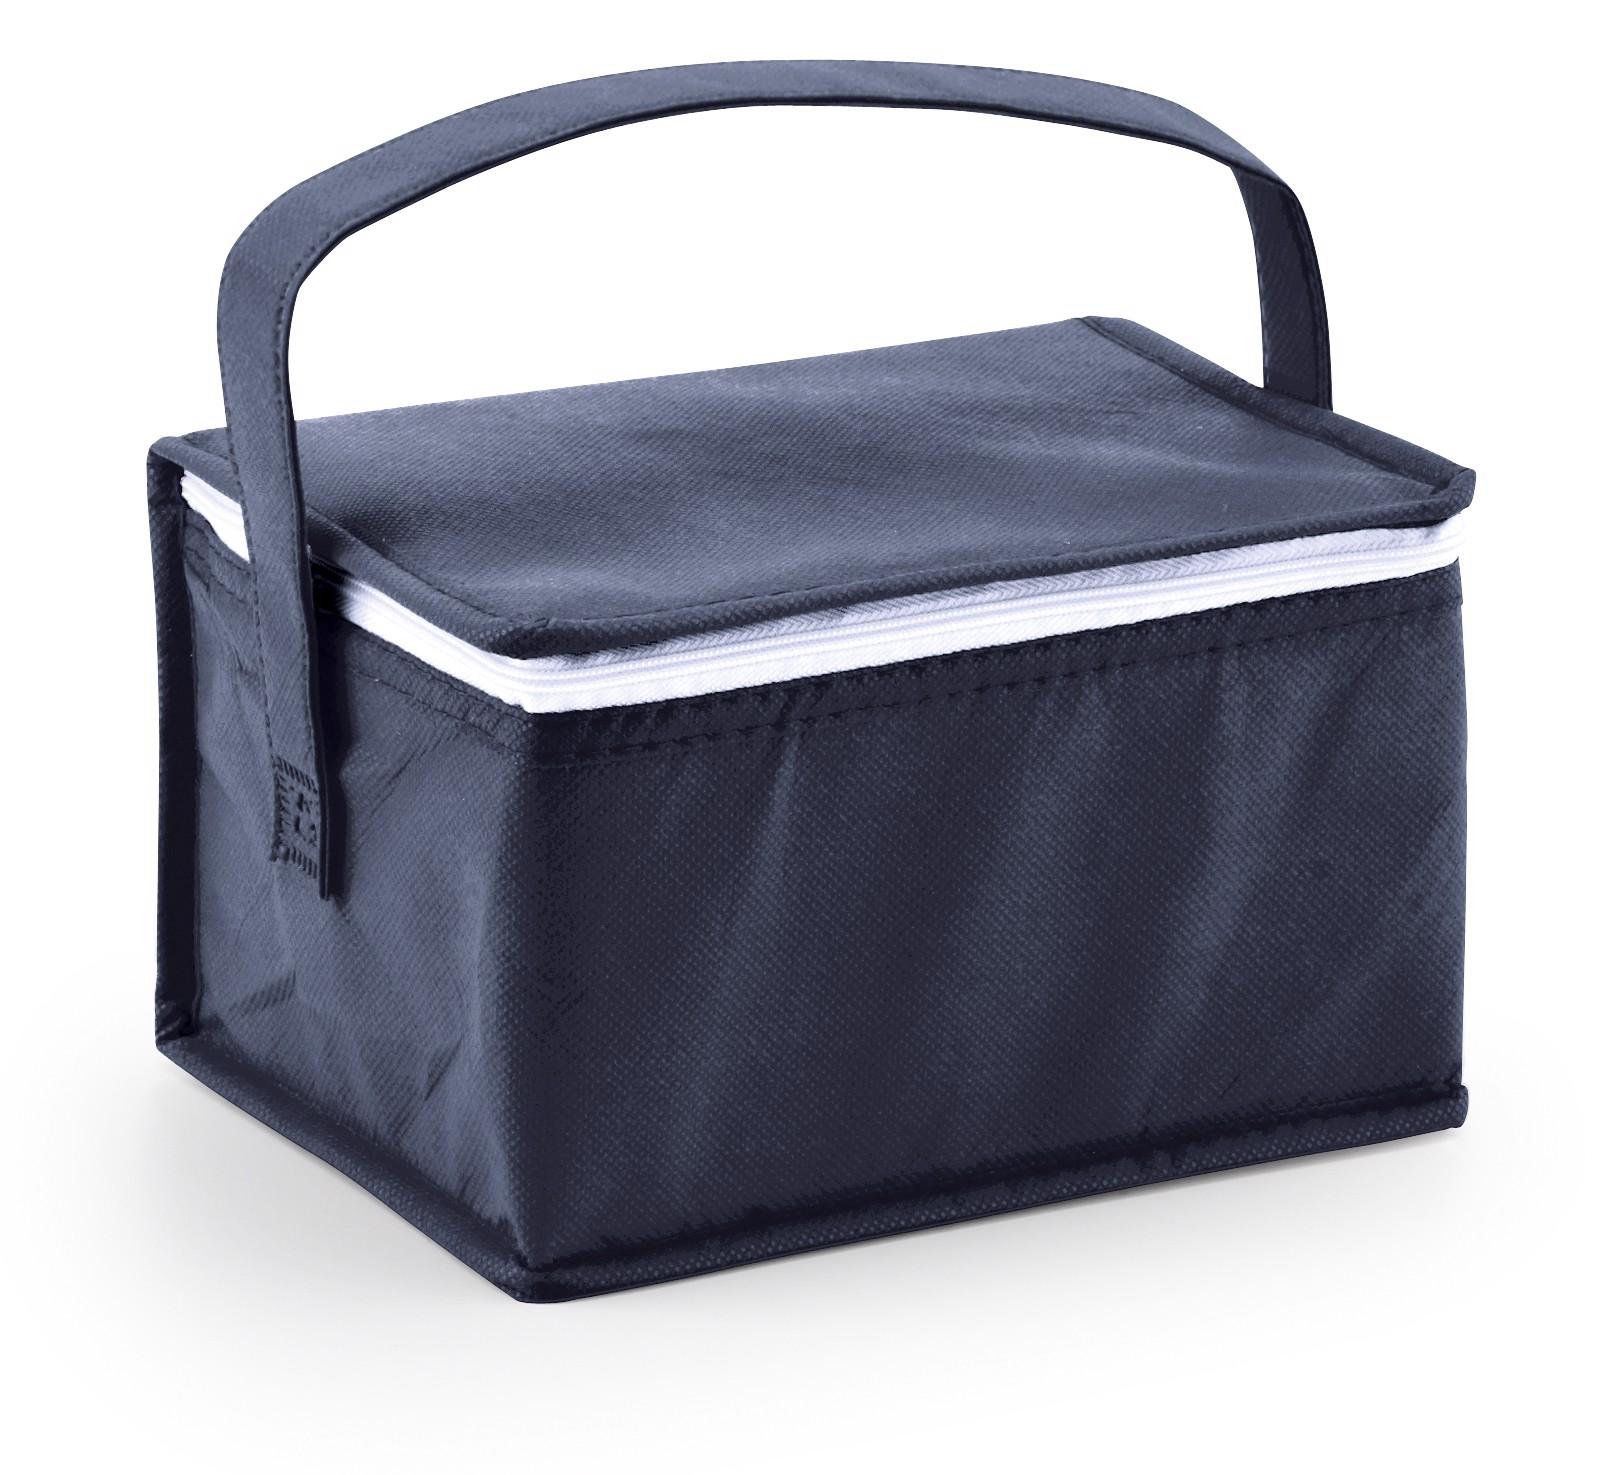 IZMIR. Cooler bag - Blue